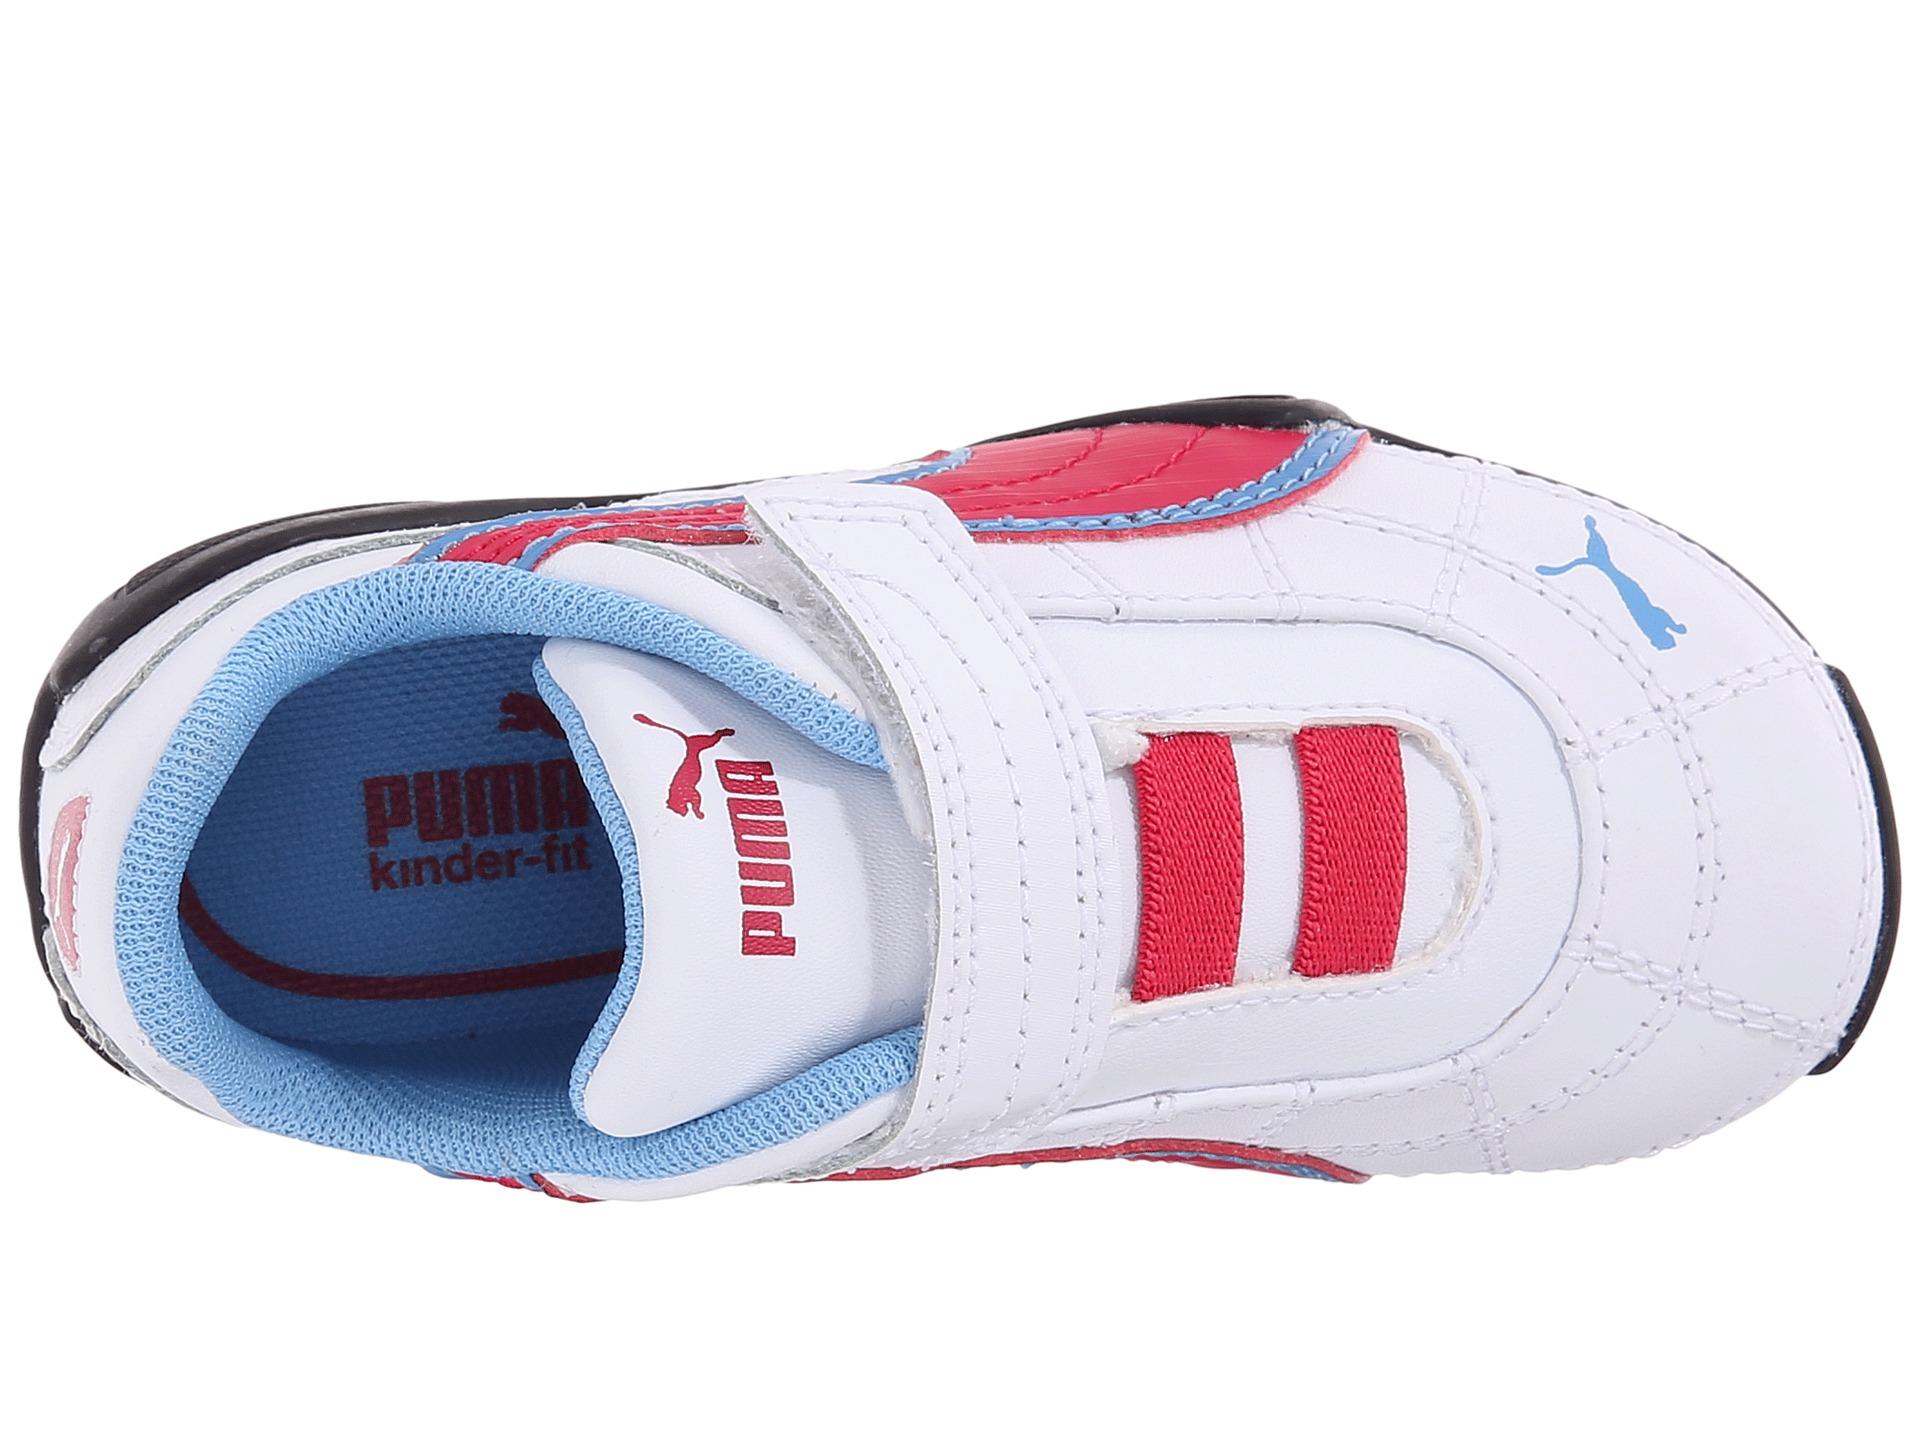 44621349c84 puma shoes run small - Grandt s Auto Repair